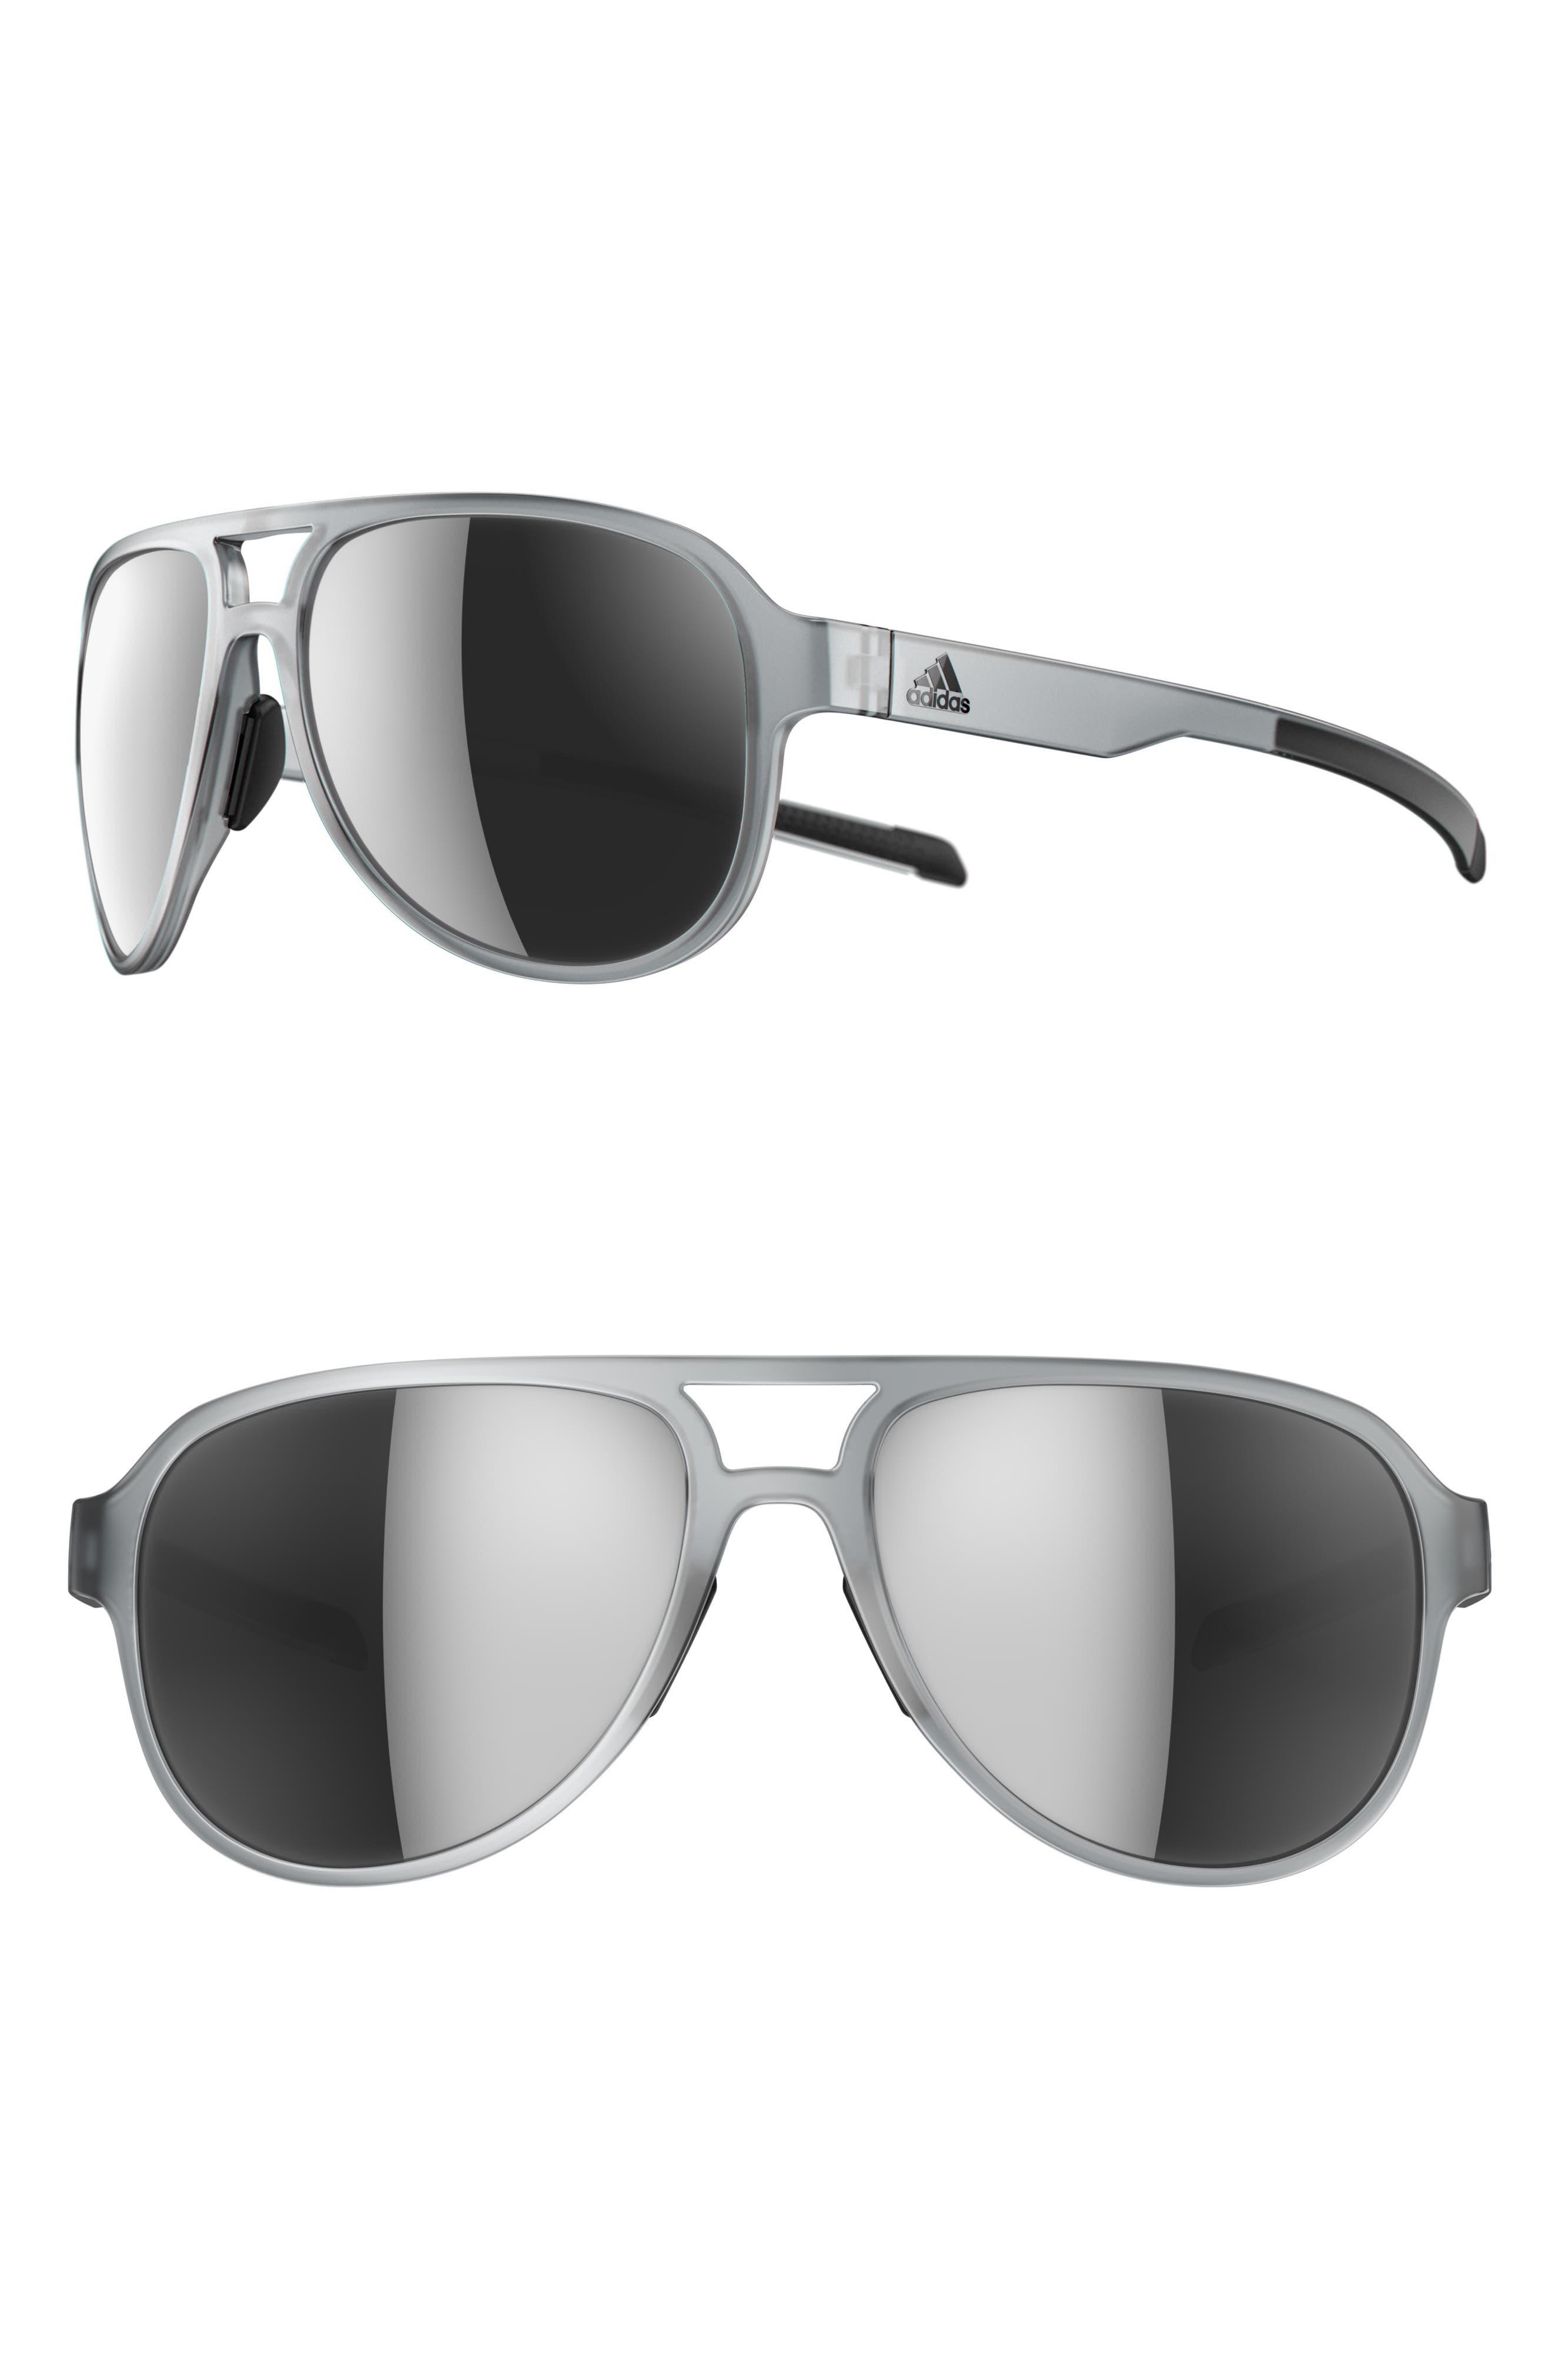 Pacyr 58mm Mirrored Sunglasses,                             Main thumbnail 1, color,                             CRYSTAL GREY/ CHROME